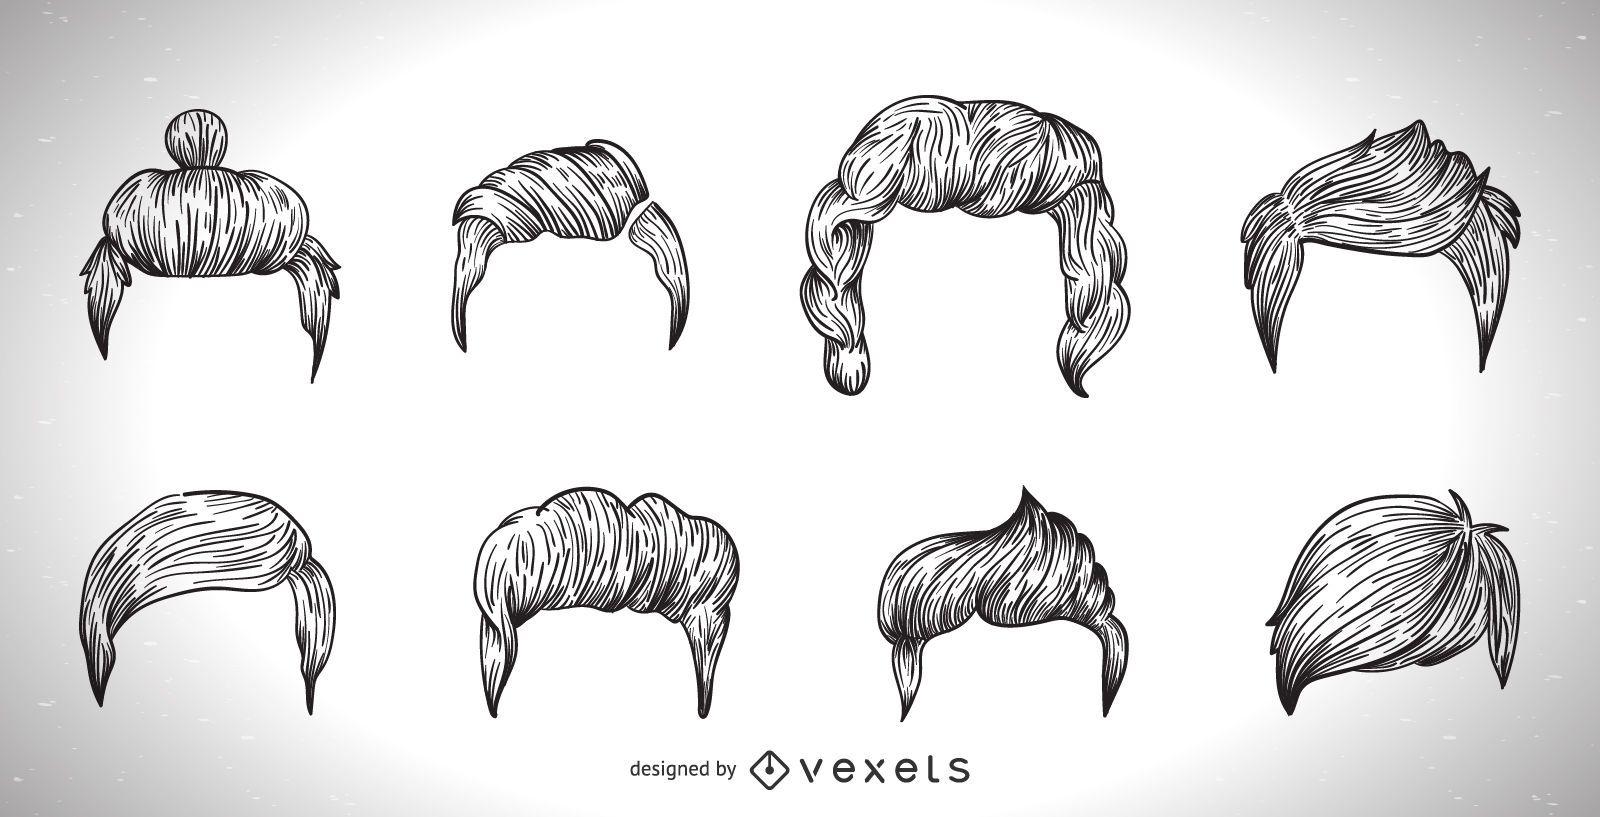 Men haircut illustration set in black and white